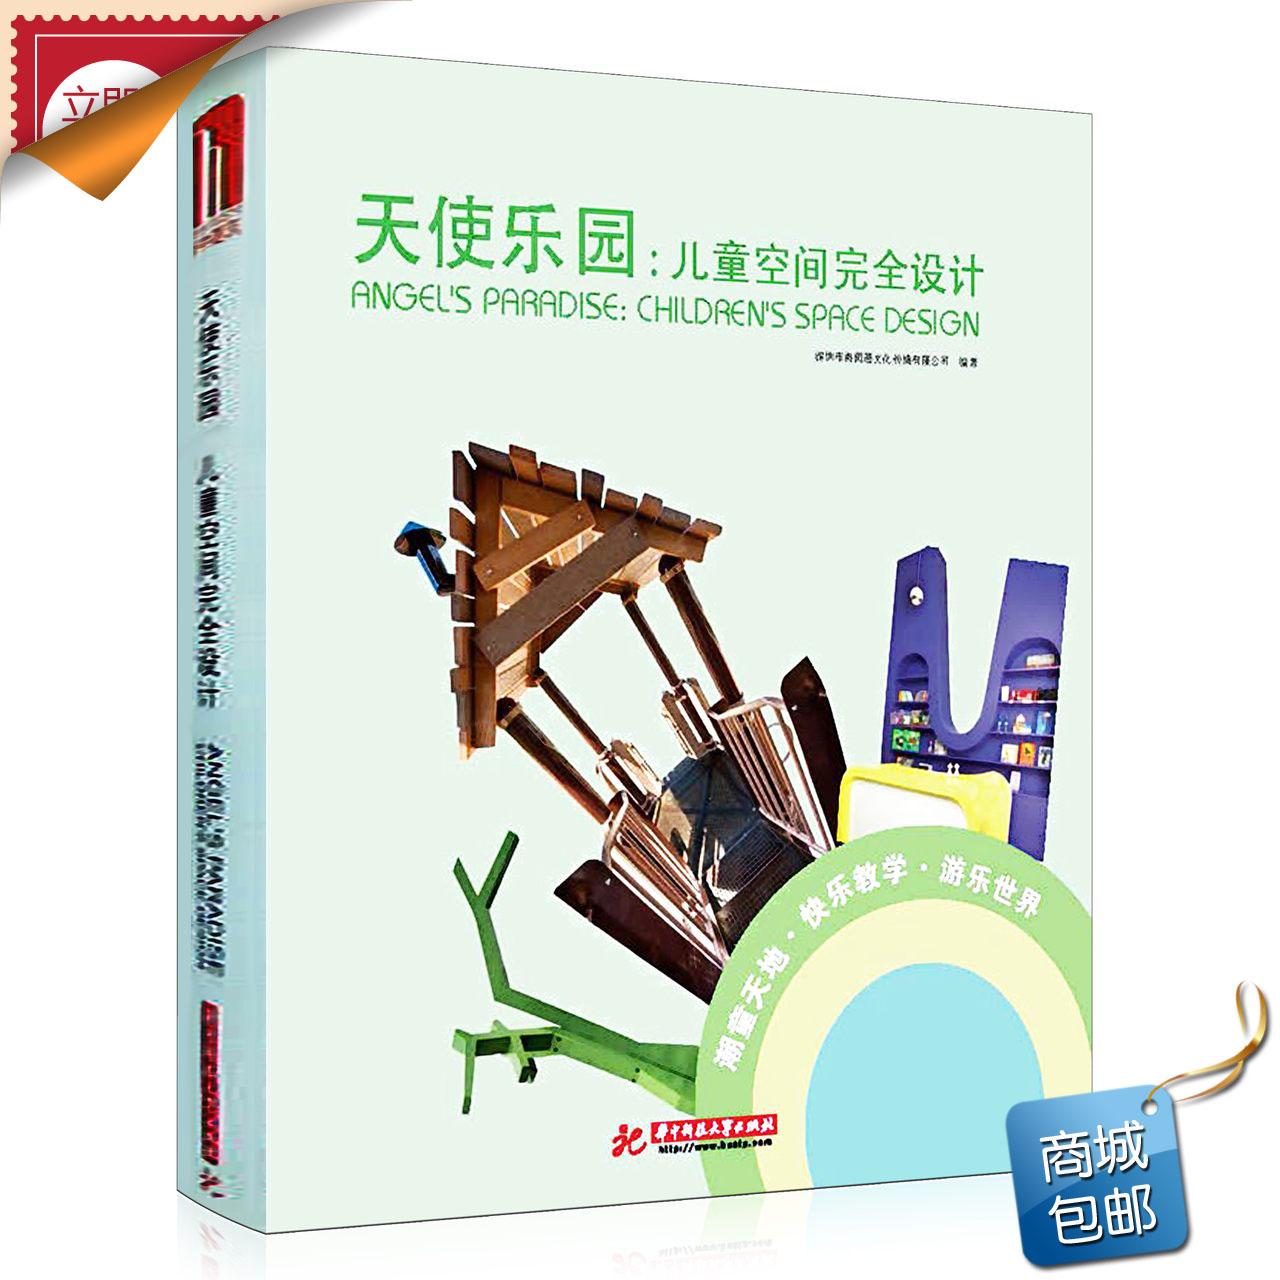 Книги о коллекционировании мебели Артикул 545406512119